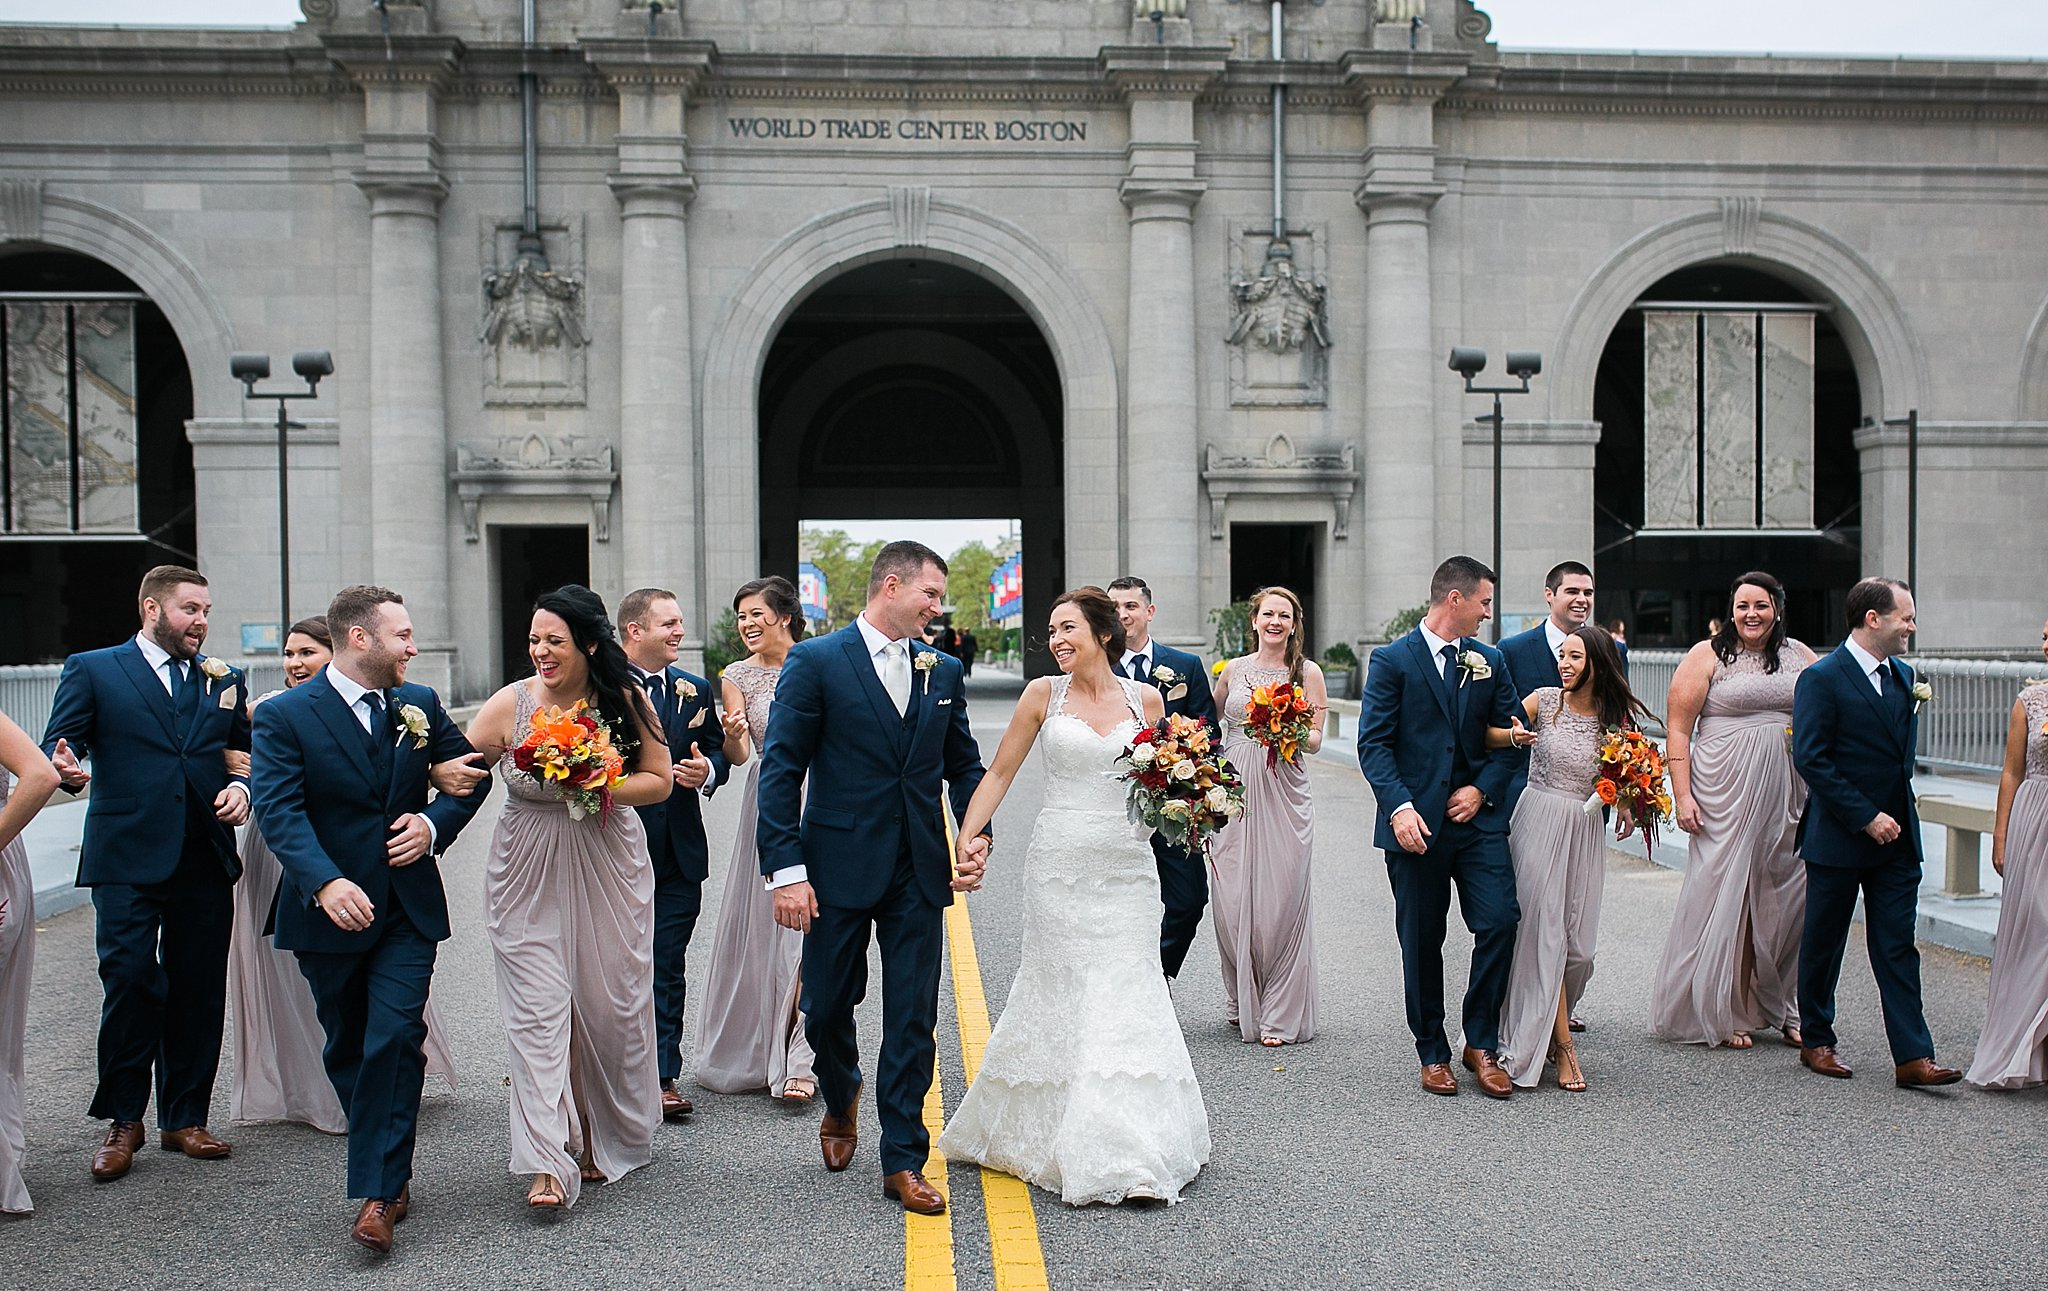 Seaport Hotel Wedding Boston Photographer Sweet Alice54.jpg